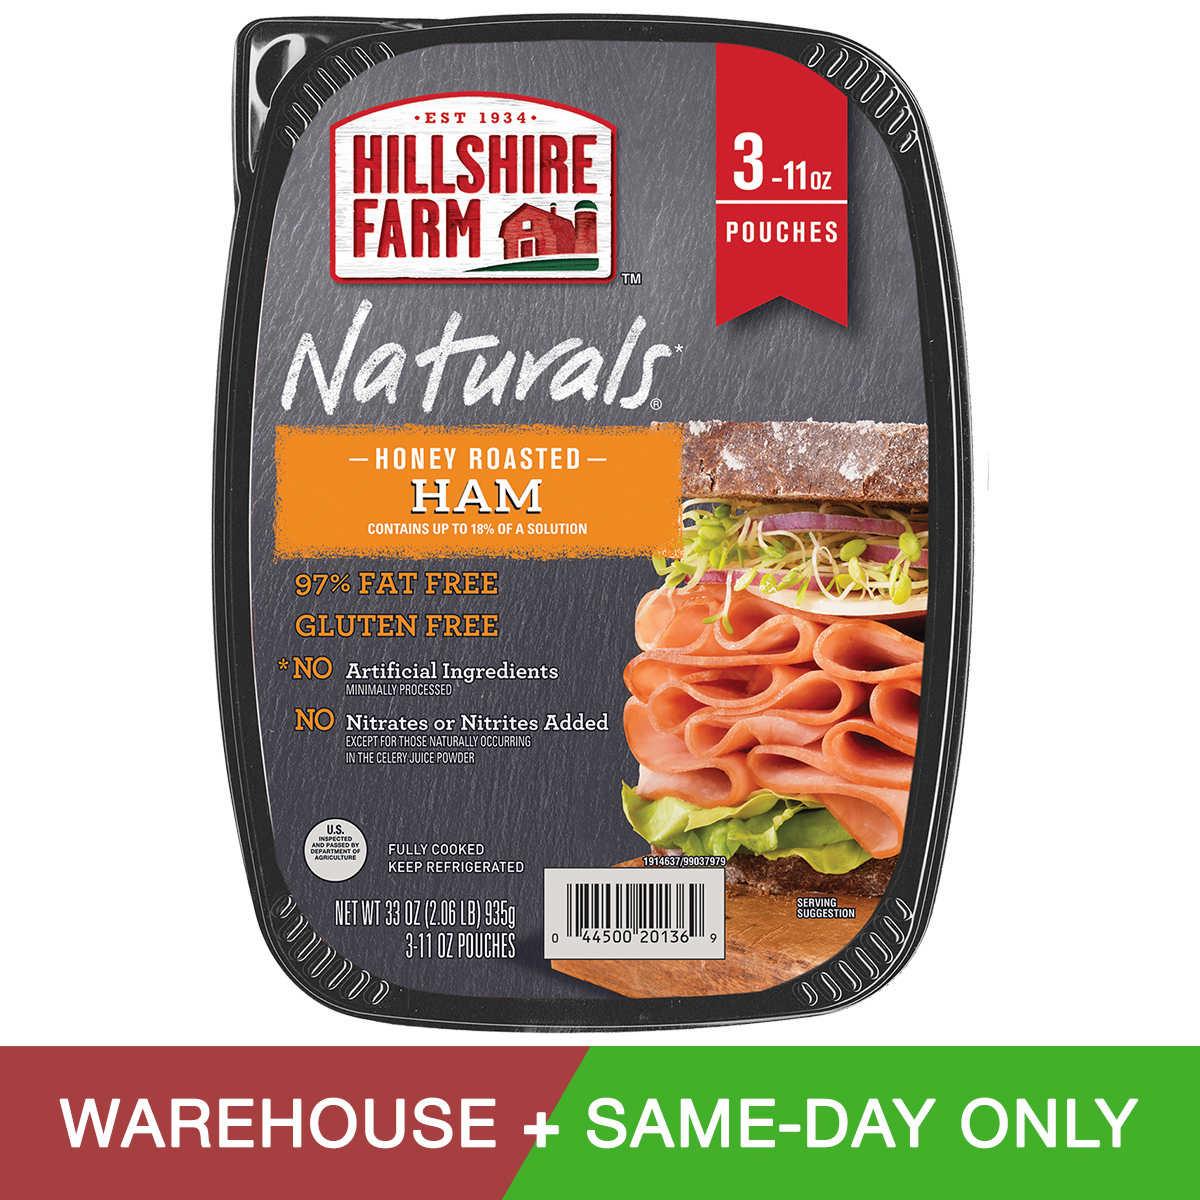 Hillshire Farm Naturals Honey Roasted Ham, 11 oz , 3-count